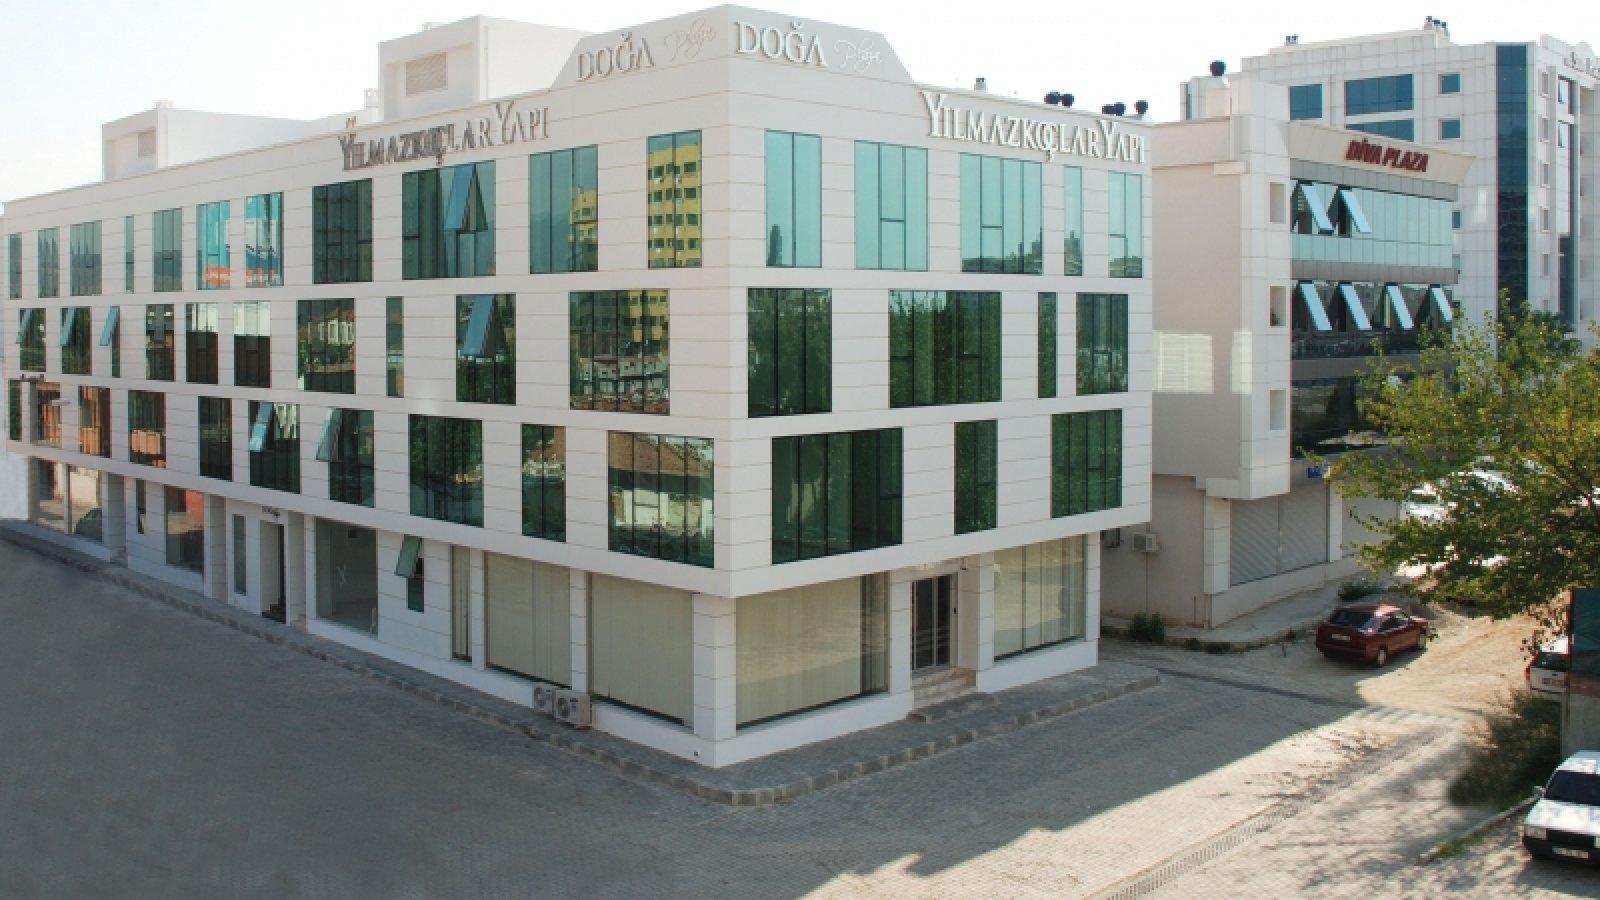 Doga Plaza